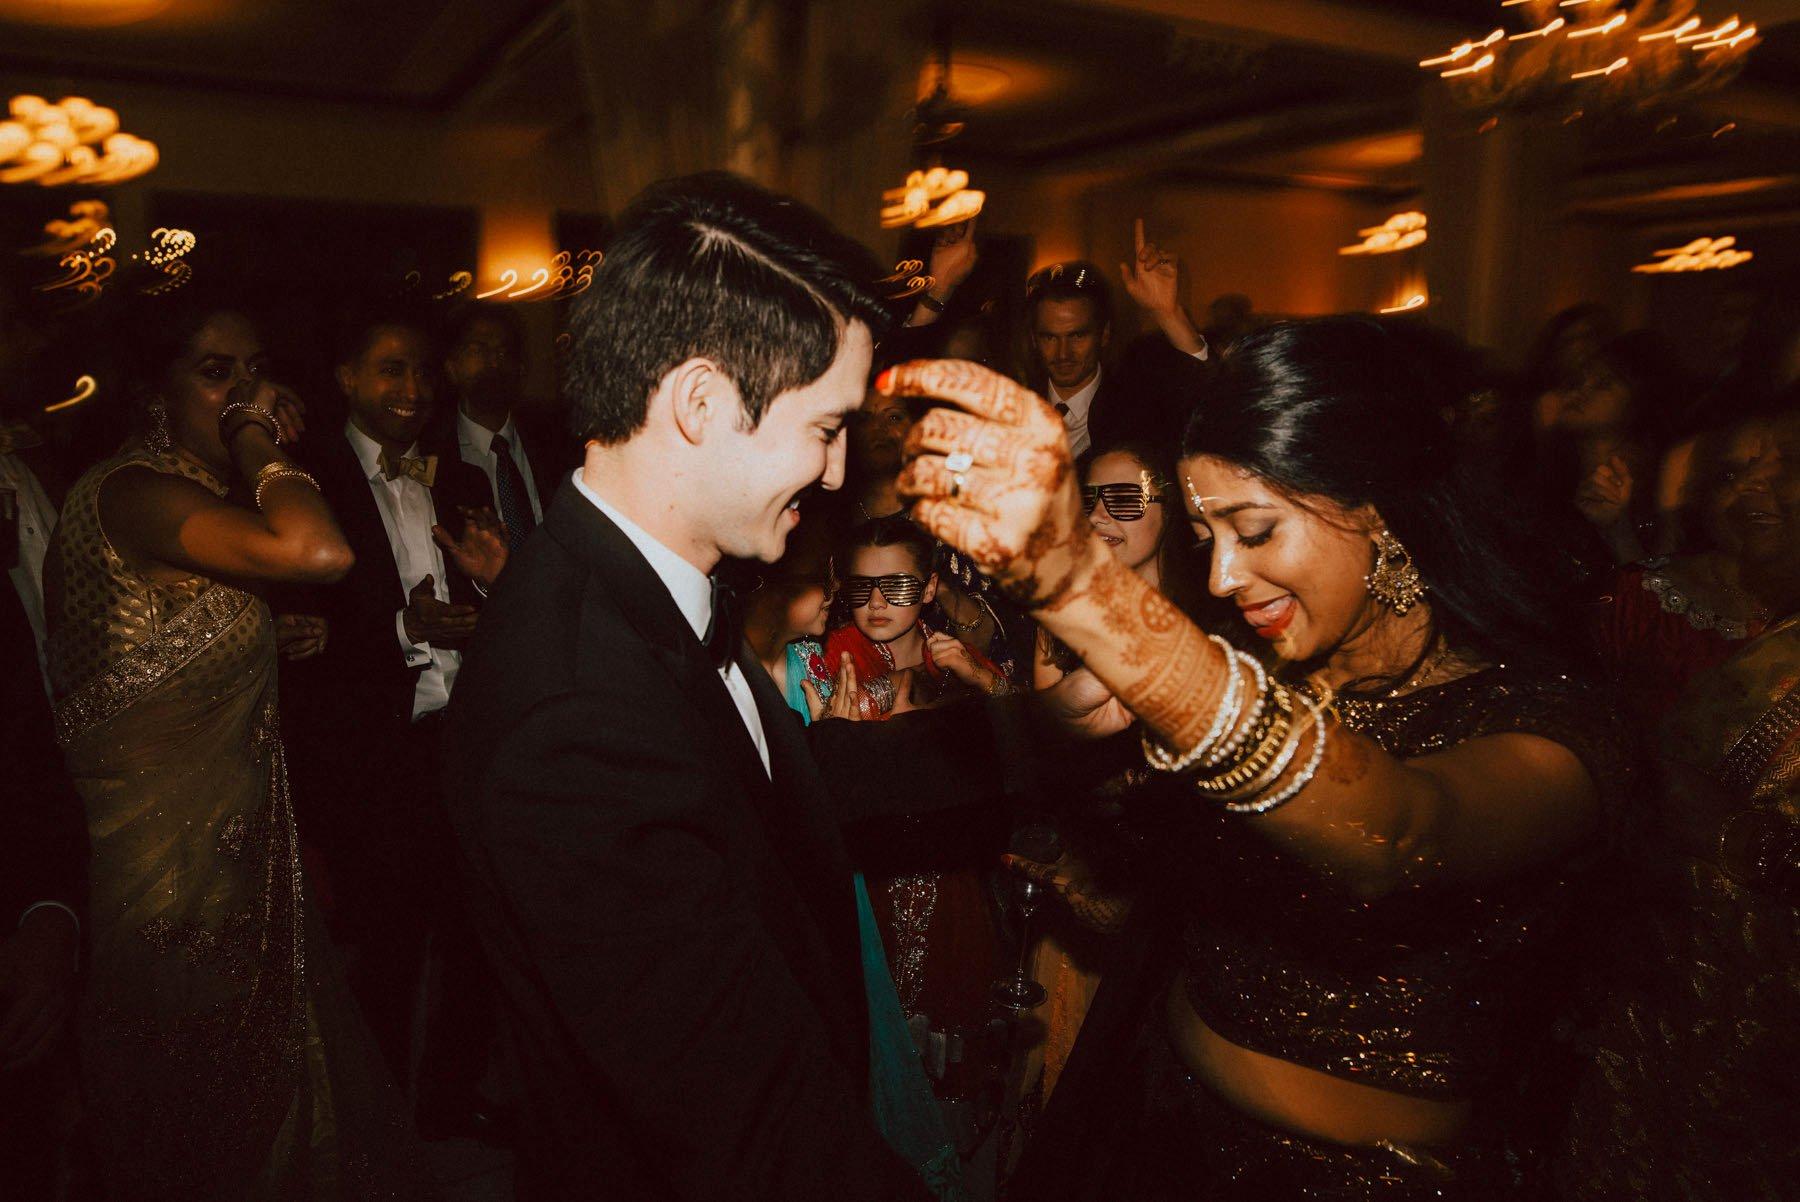 vie-philadelphia-indian-wedding-128.jpg